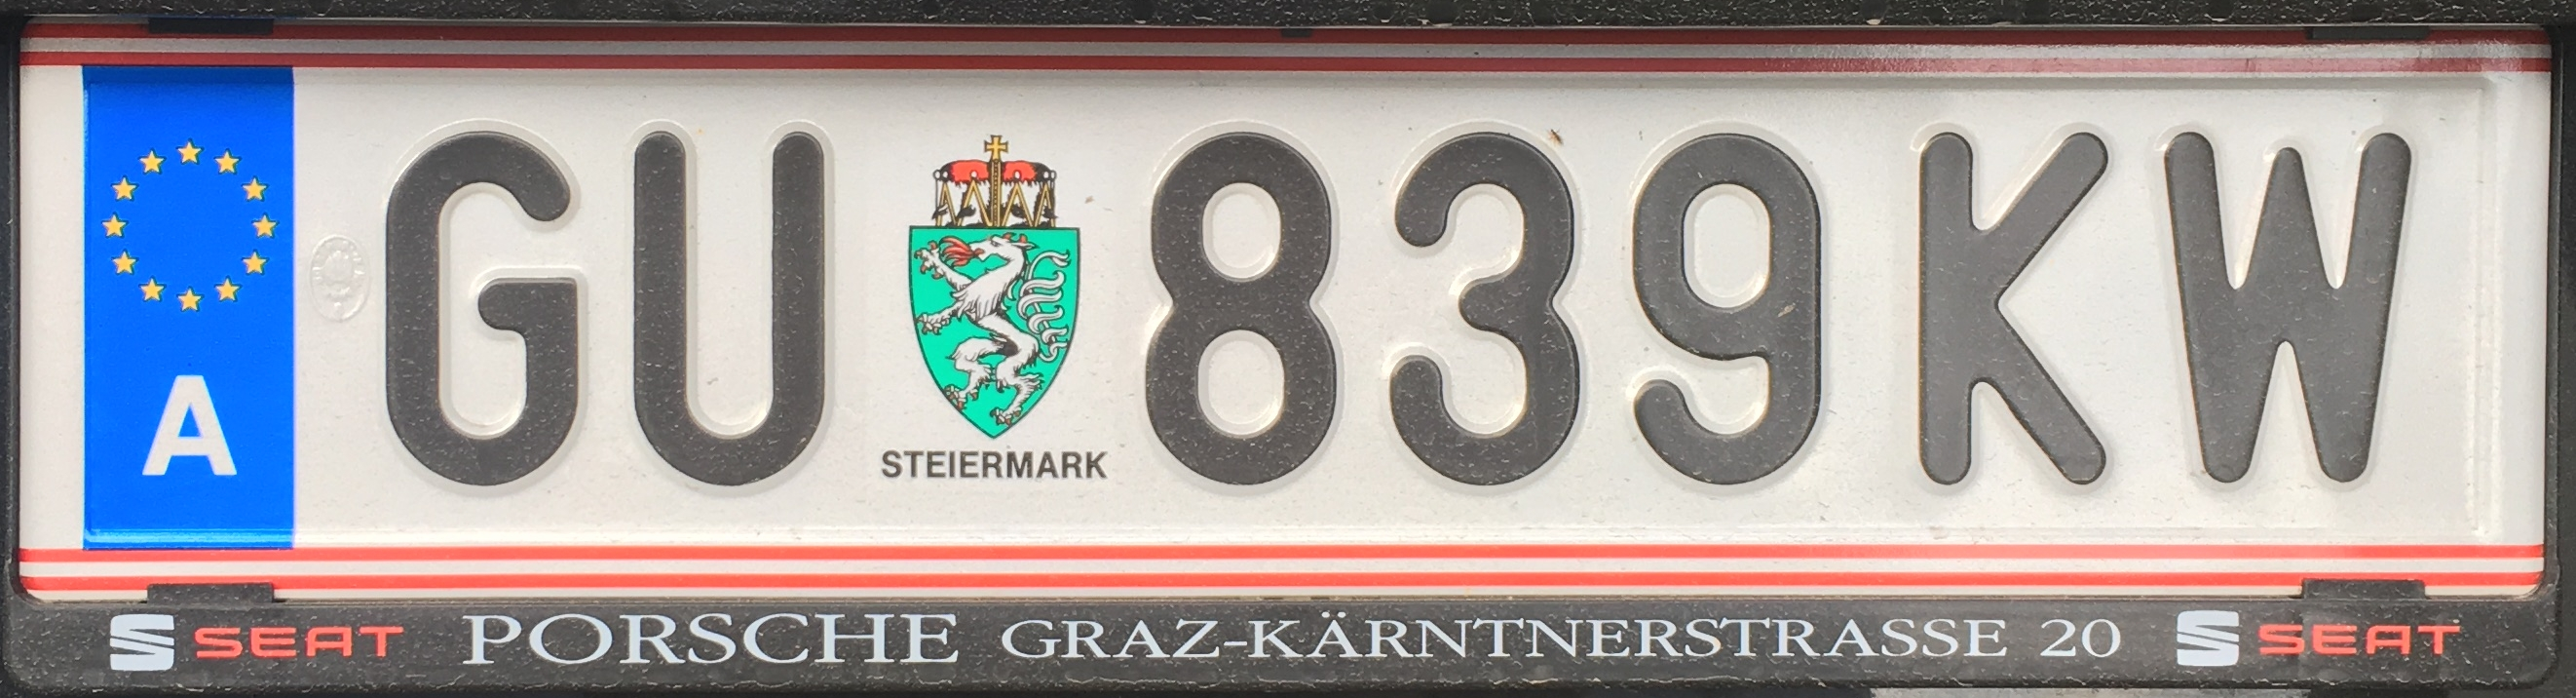 Registrační značka Rakousko - GU - Graz-venkov, foto: www.podalnici.cz